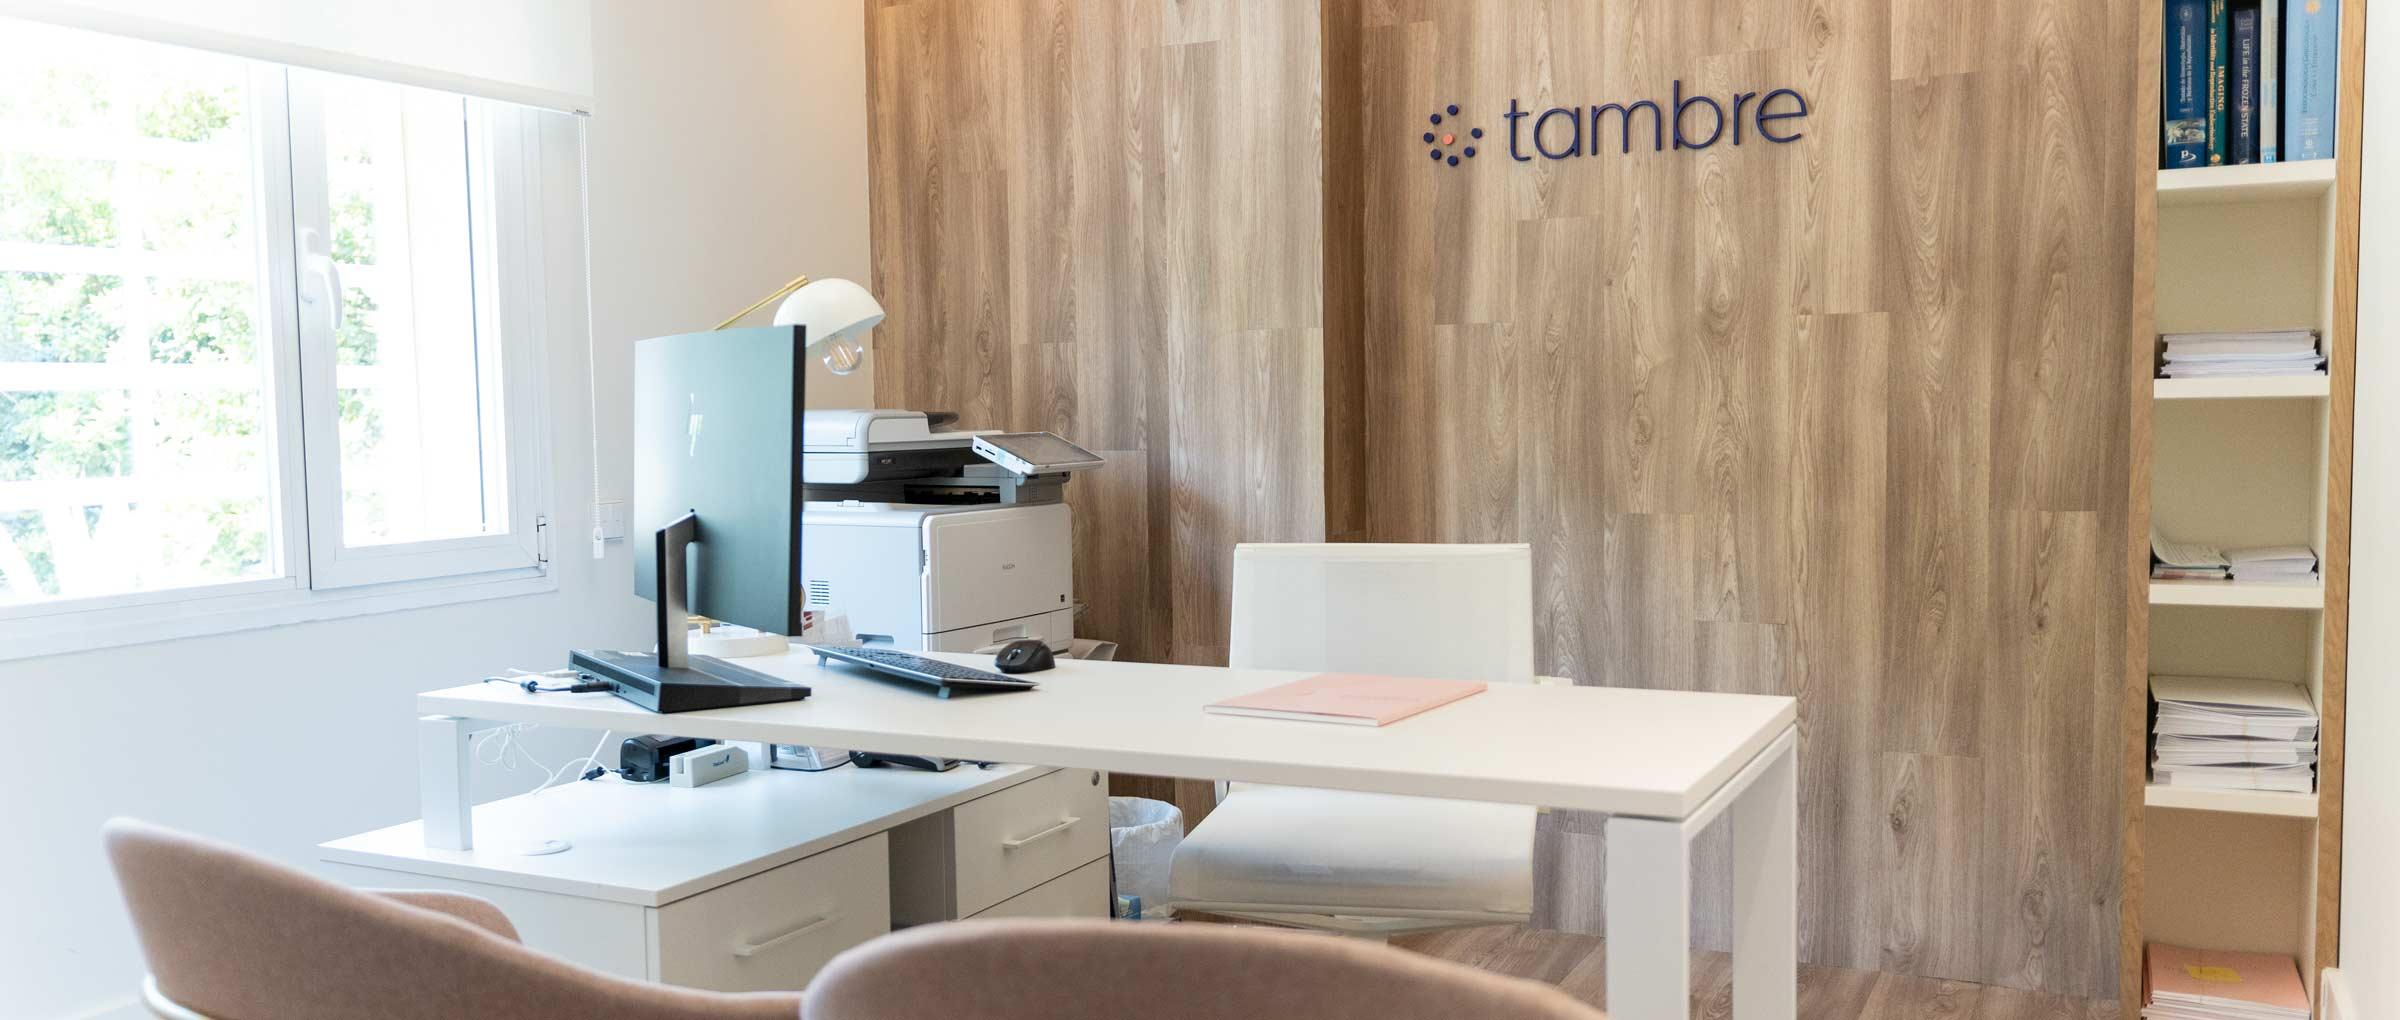 Consultation of Clínica Tambre